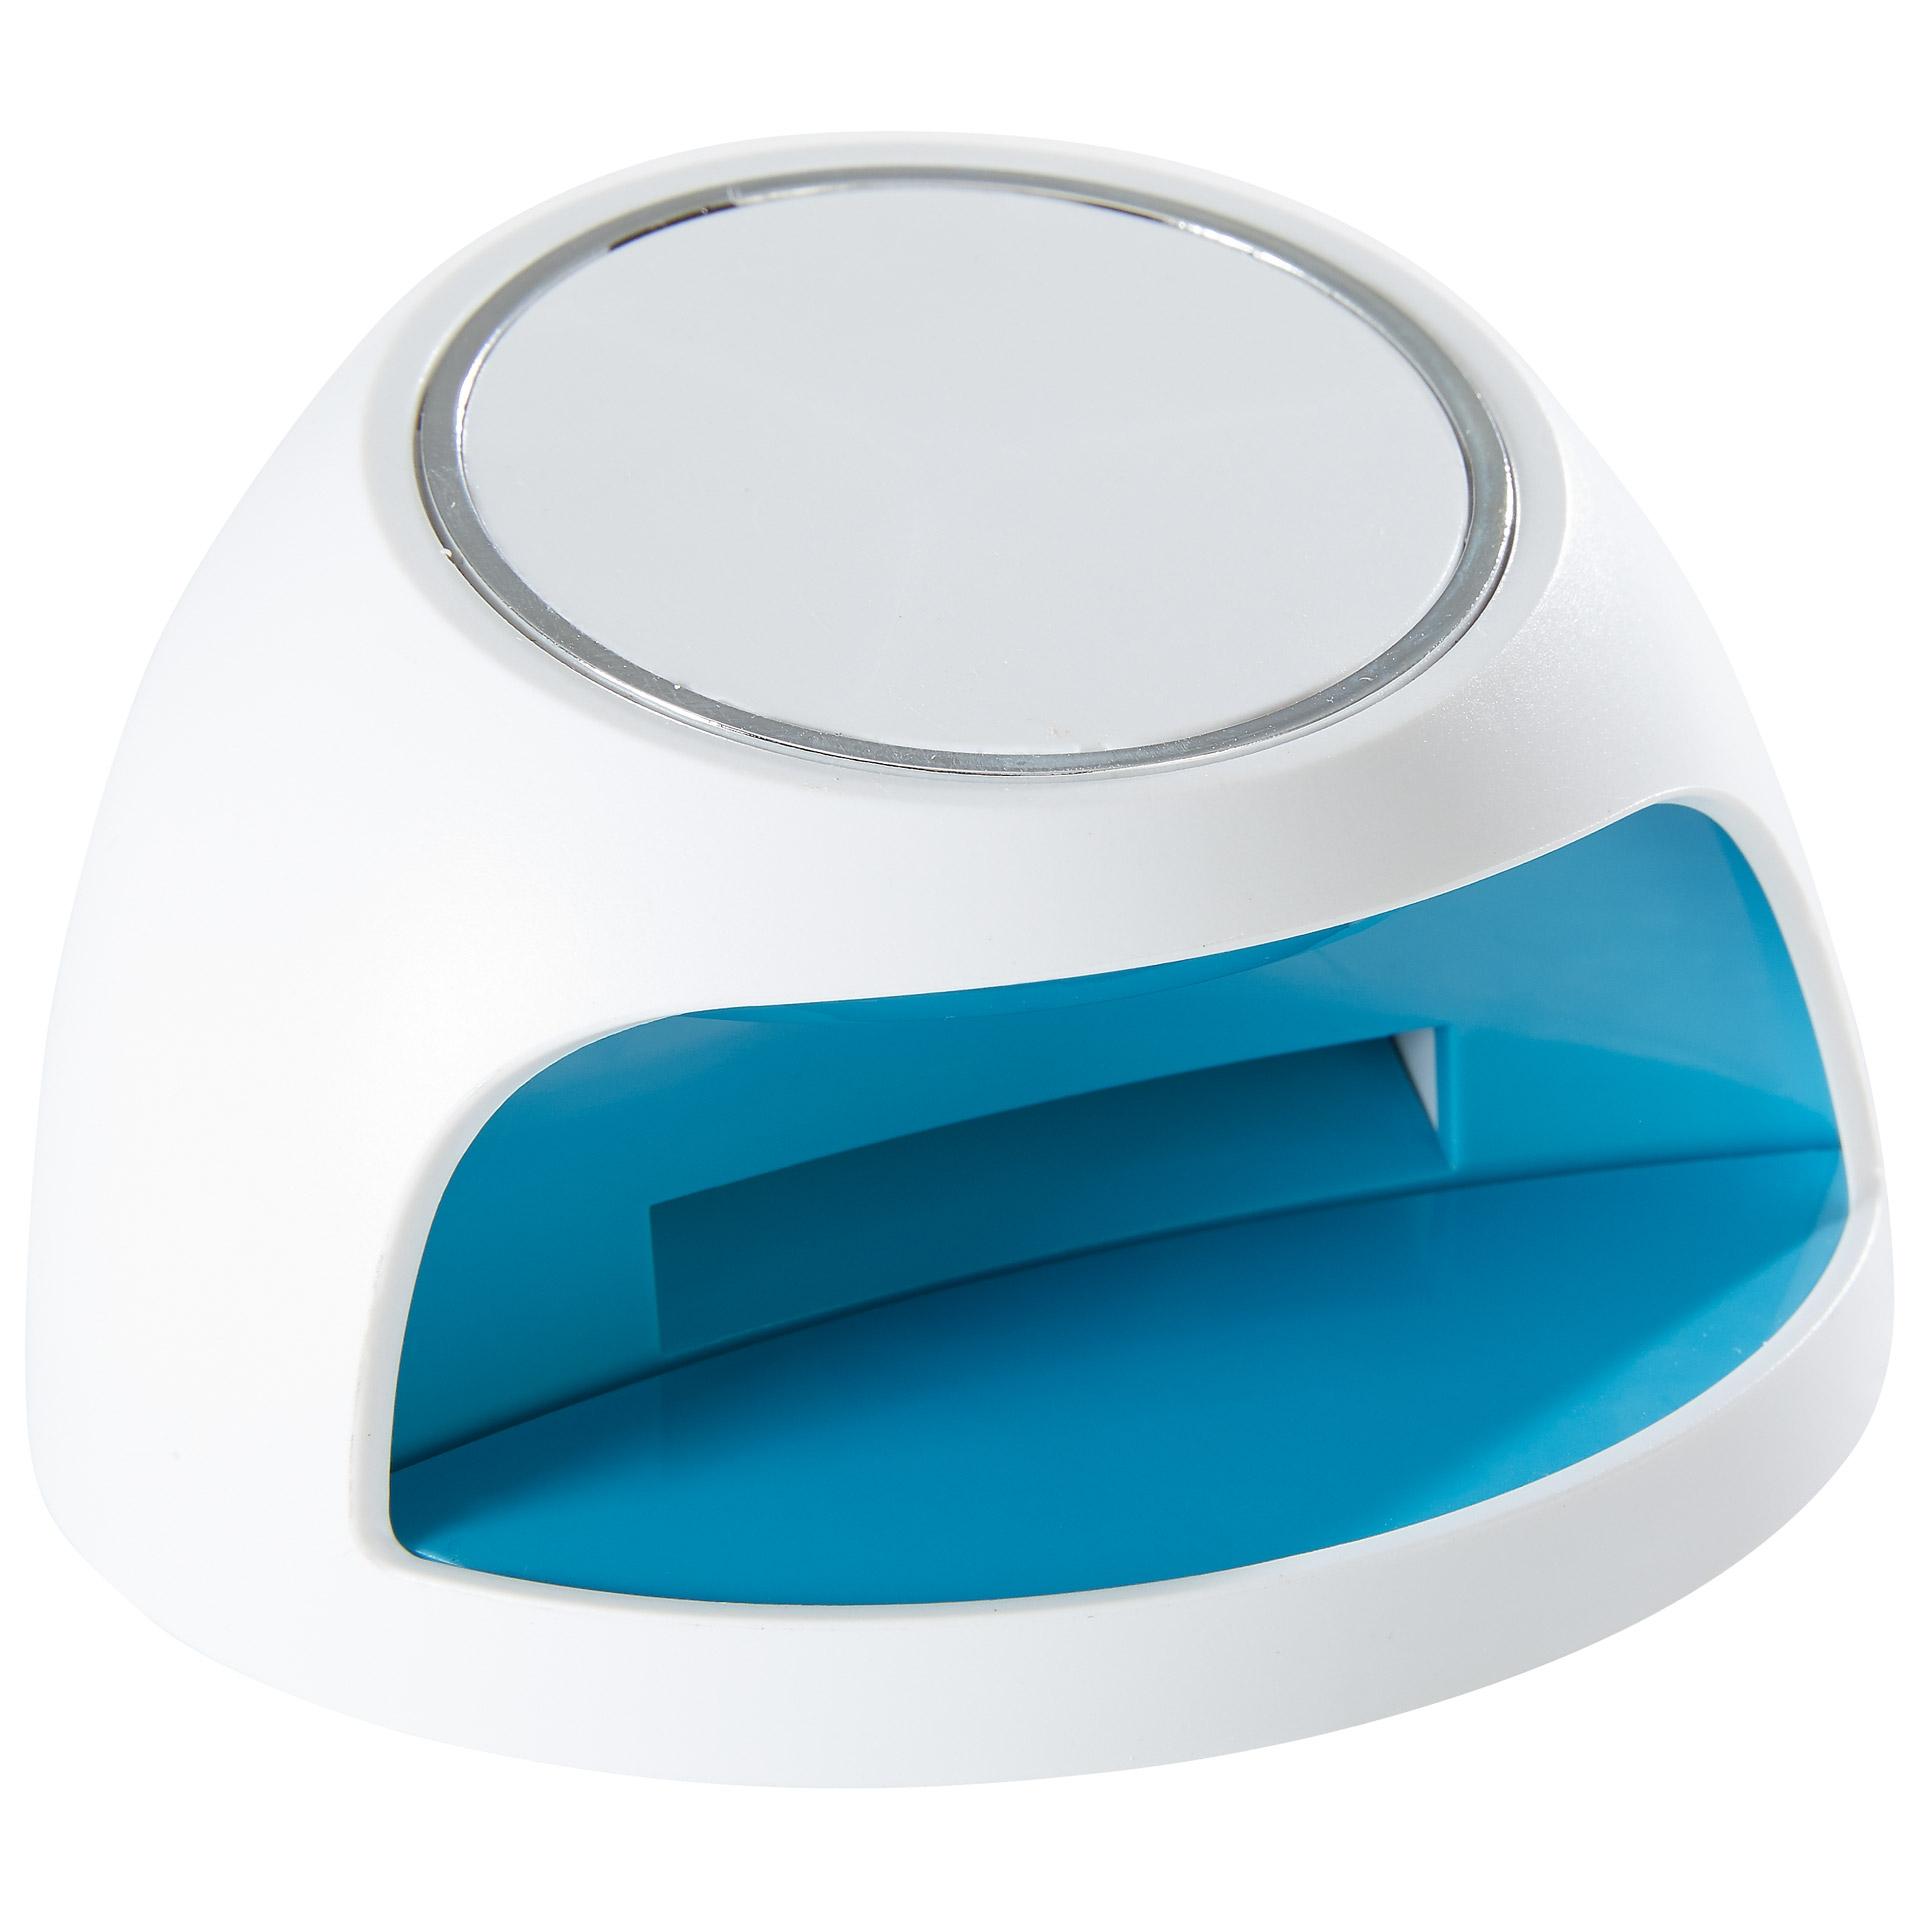 UV-Nageltrockner (batteriebetrieben)